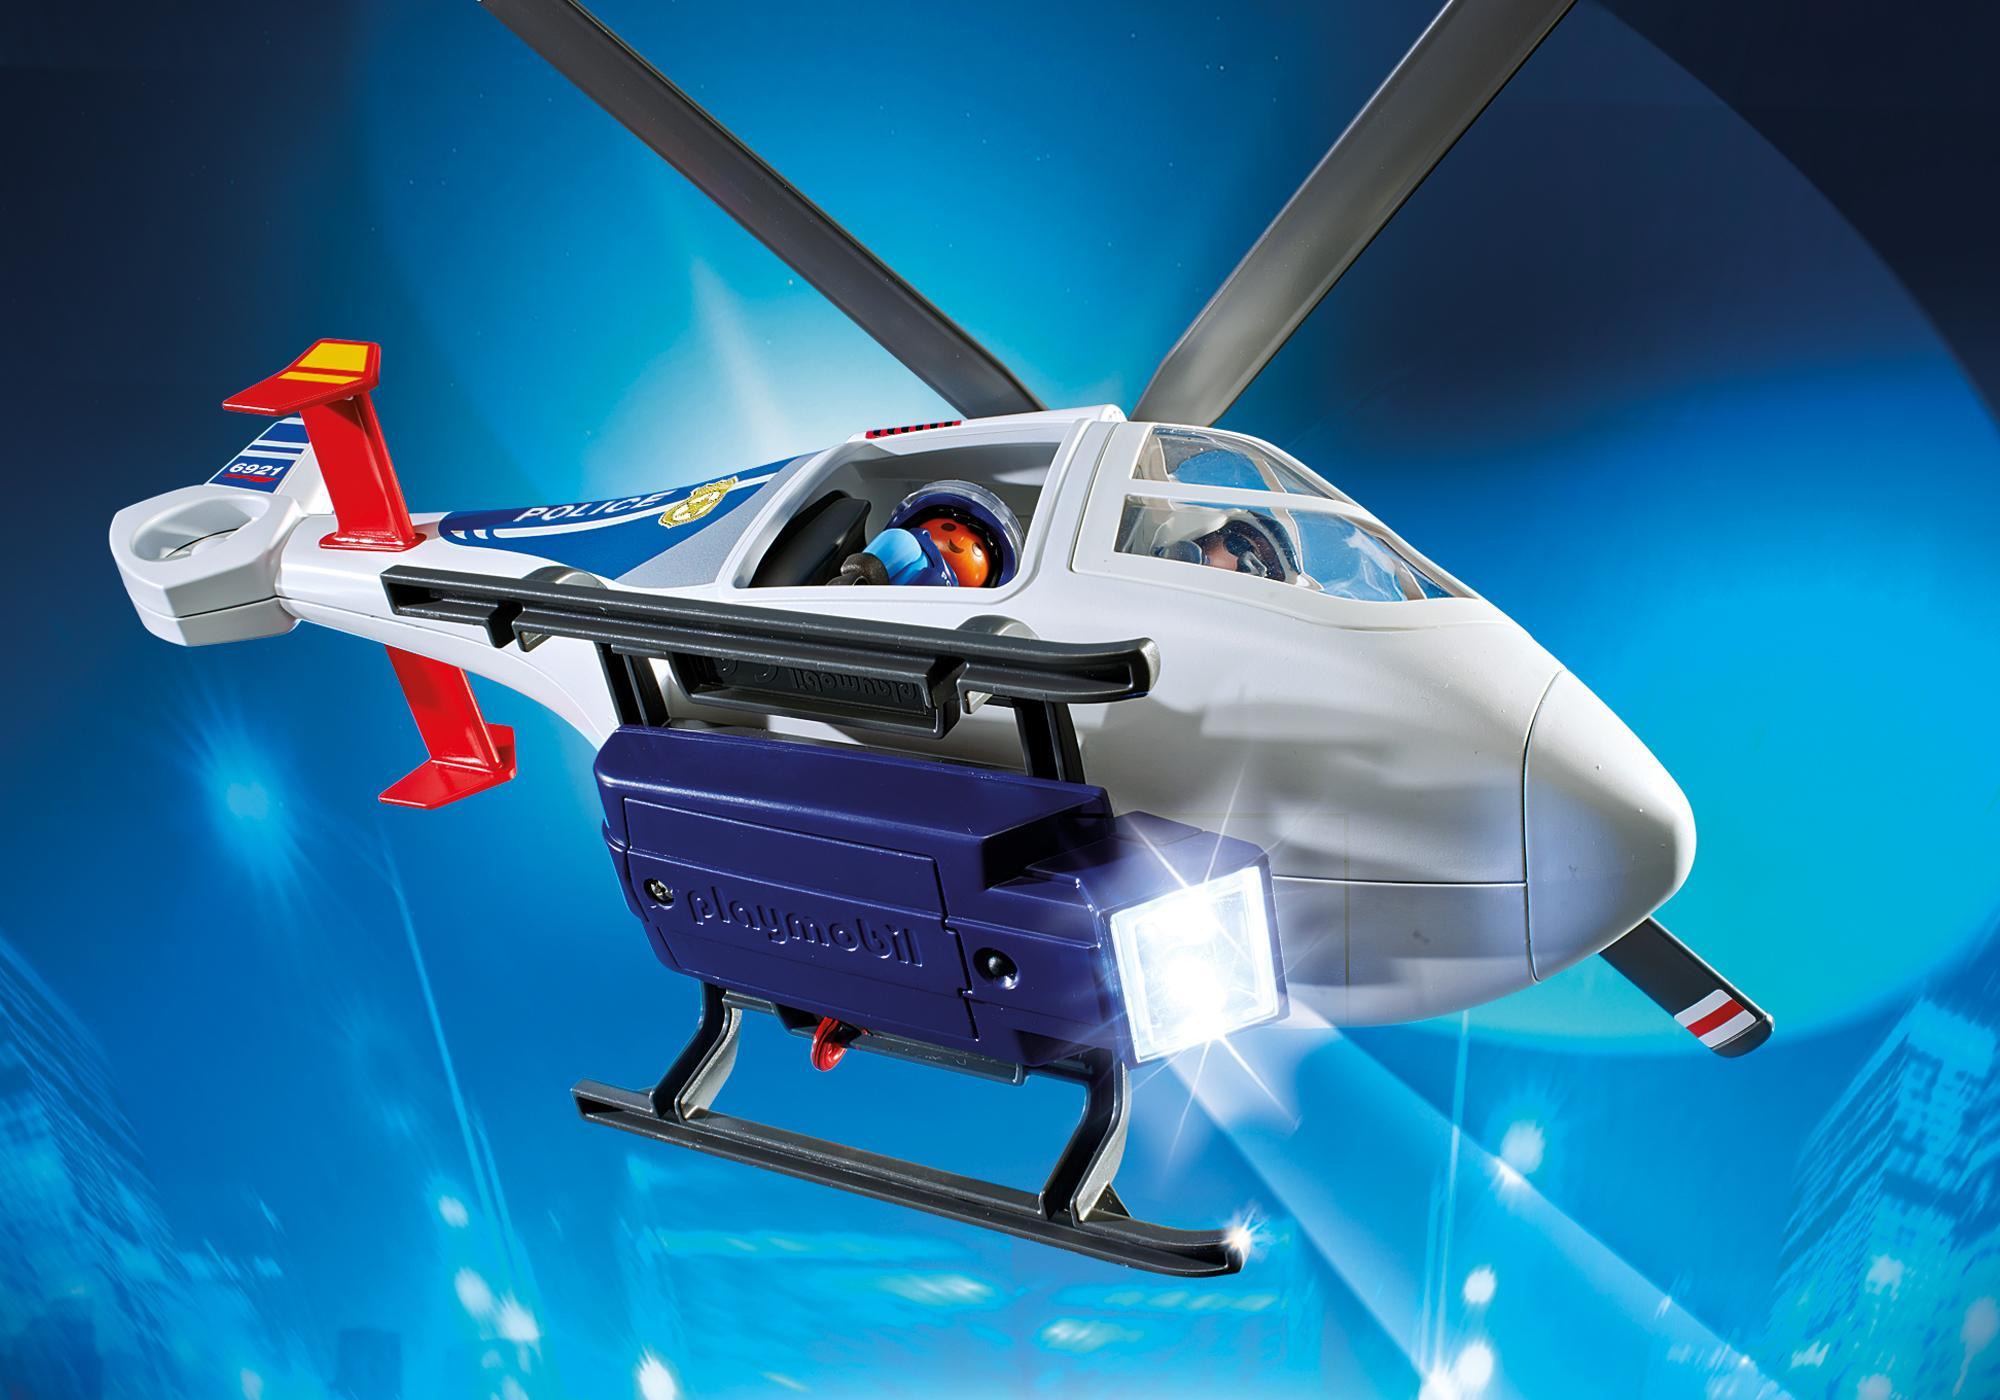 http://media.playmobil.com/i/playmobil/6921_product_extra3/Politiehelikopter met LED-zoeklicht